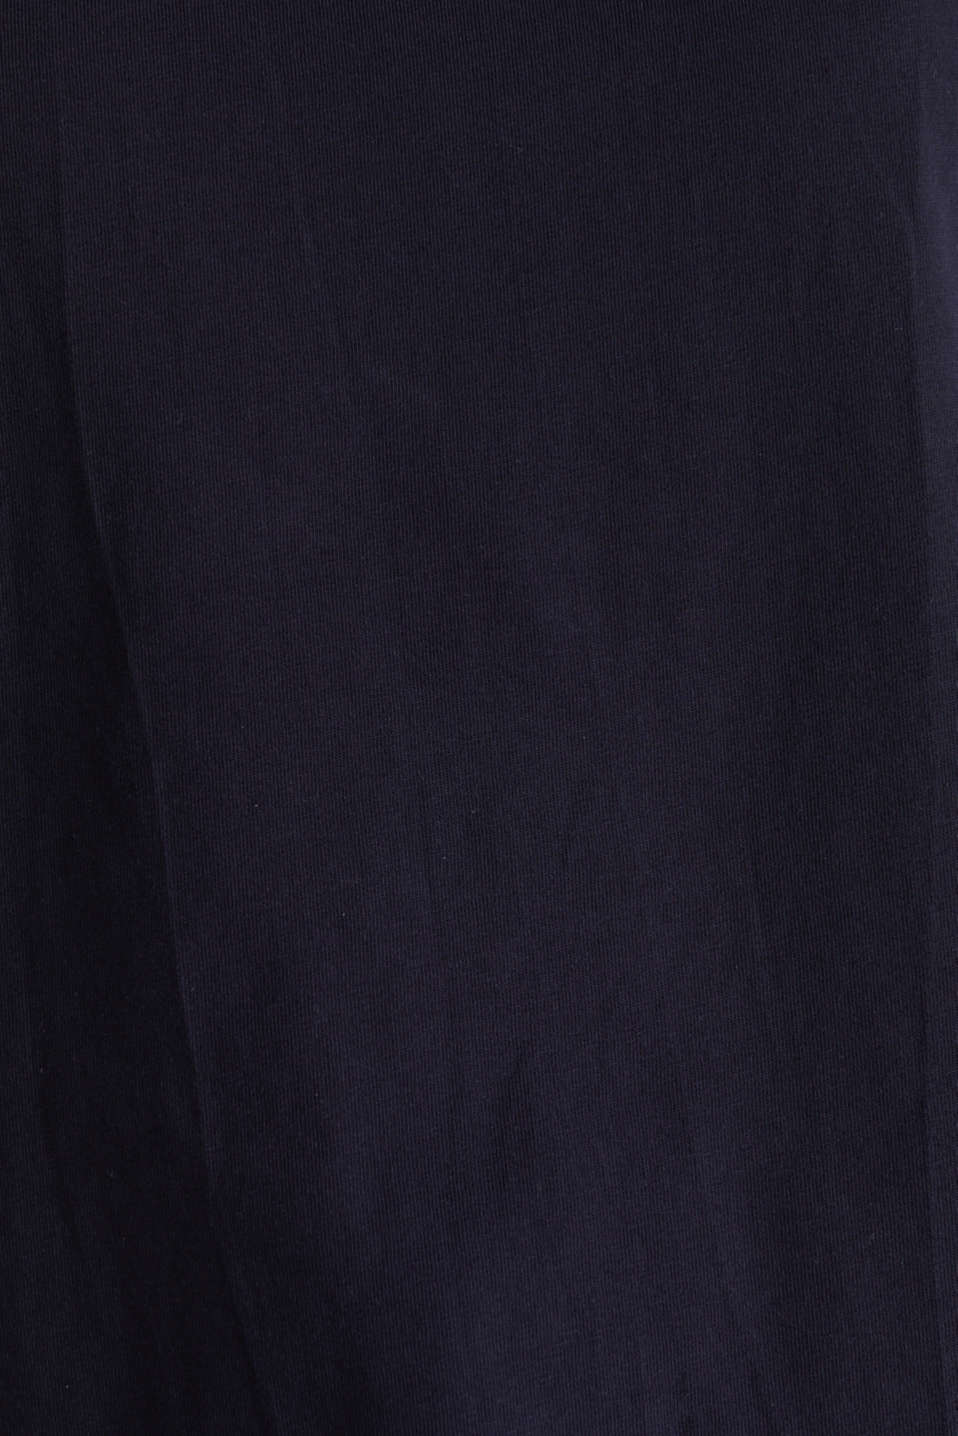 Loose-cut top, NAVY, detail image number 4